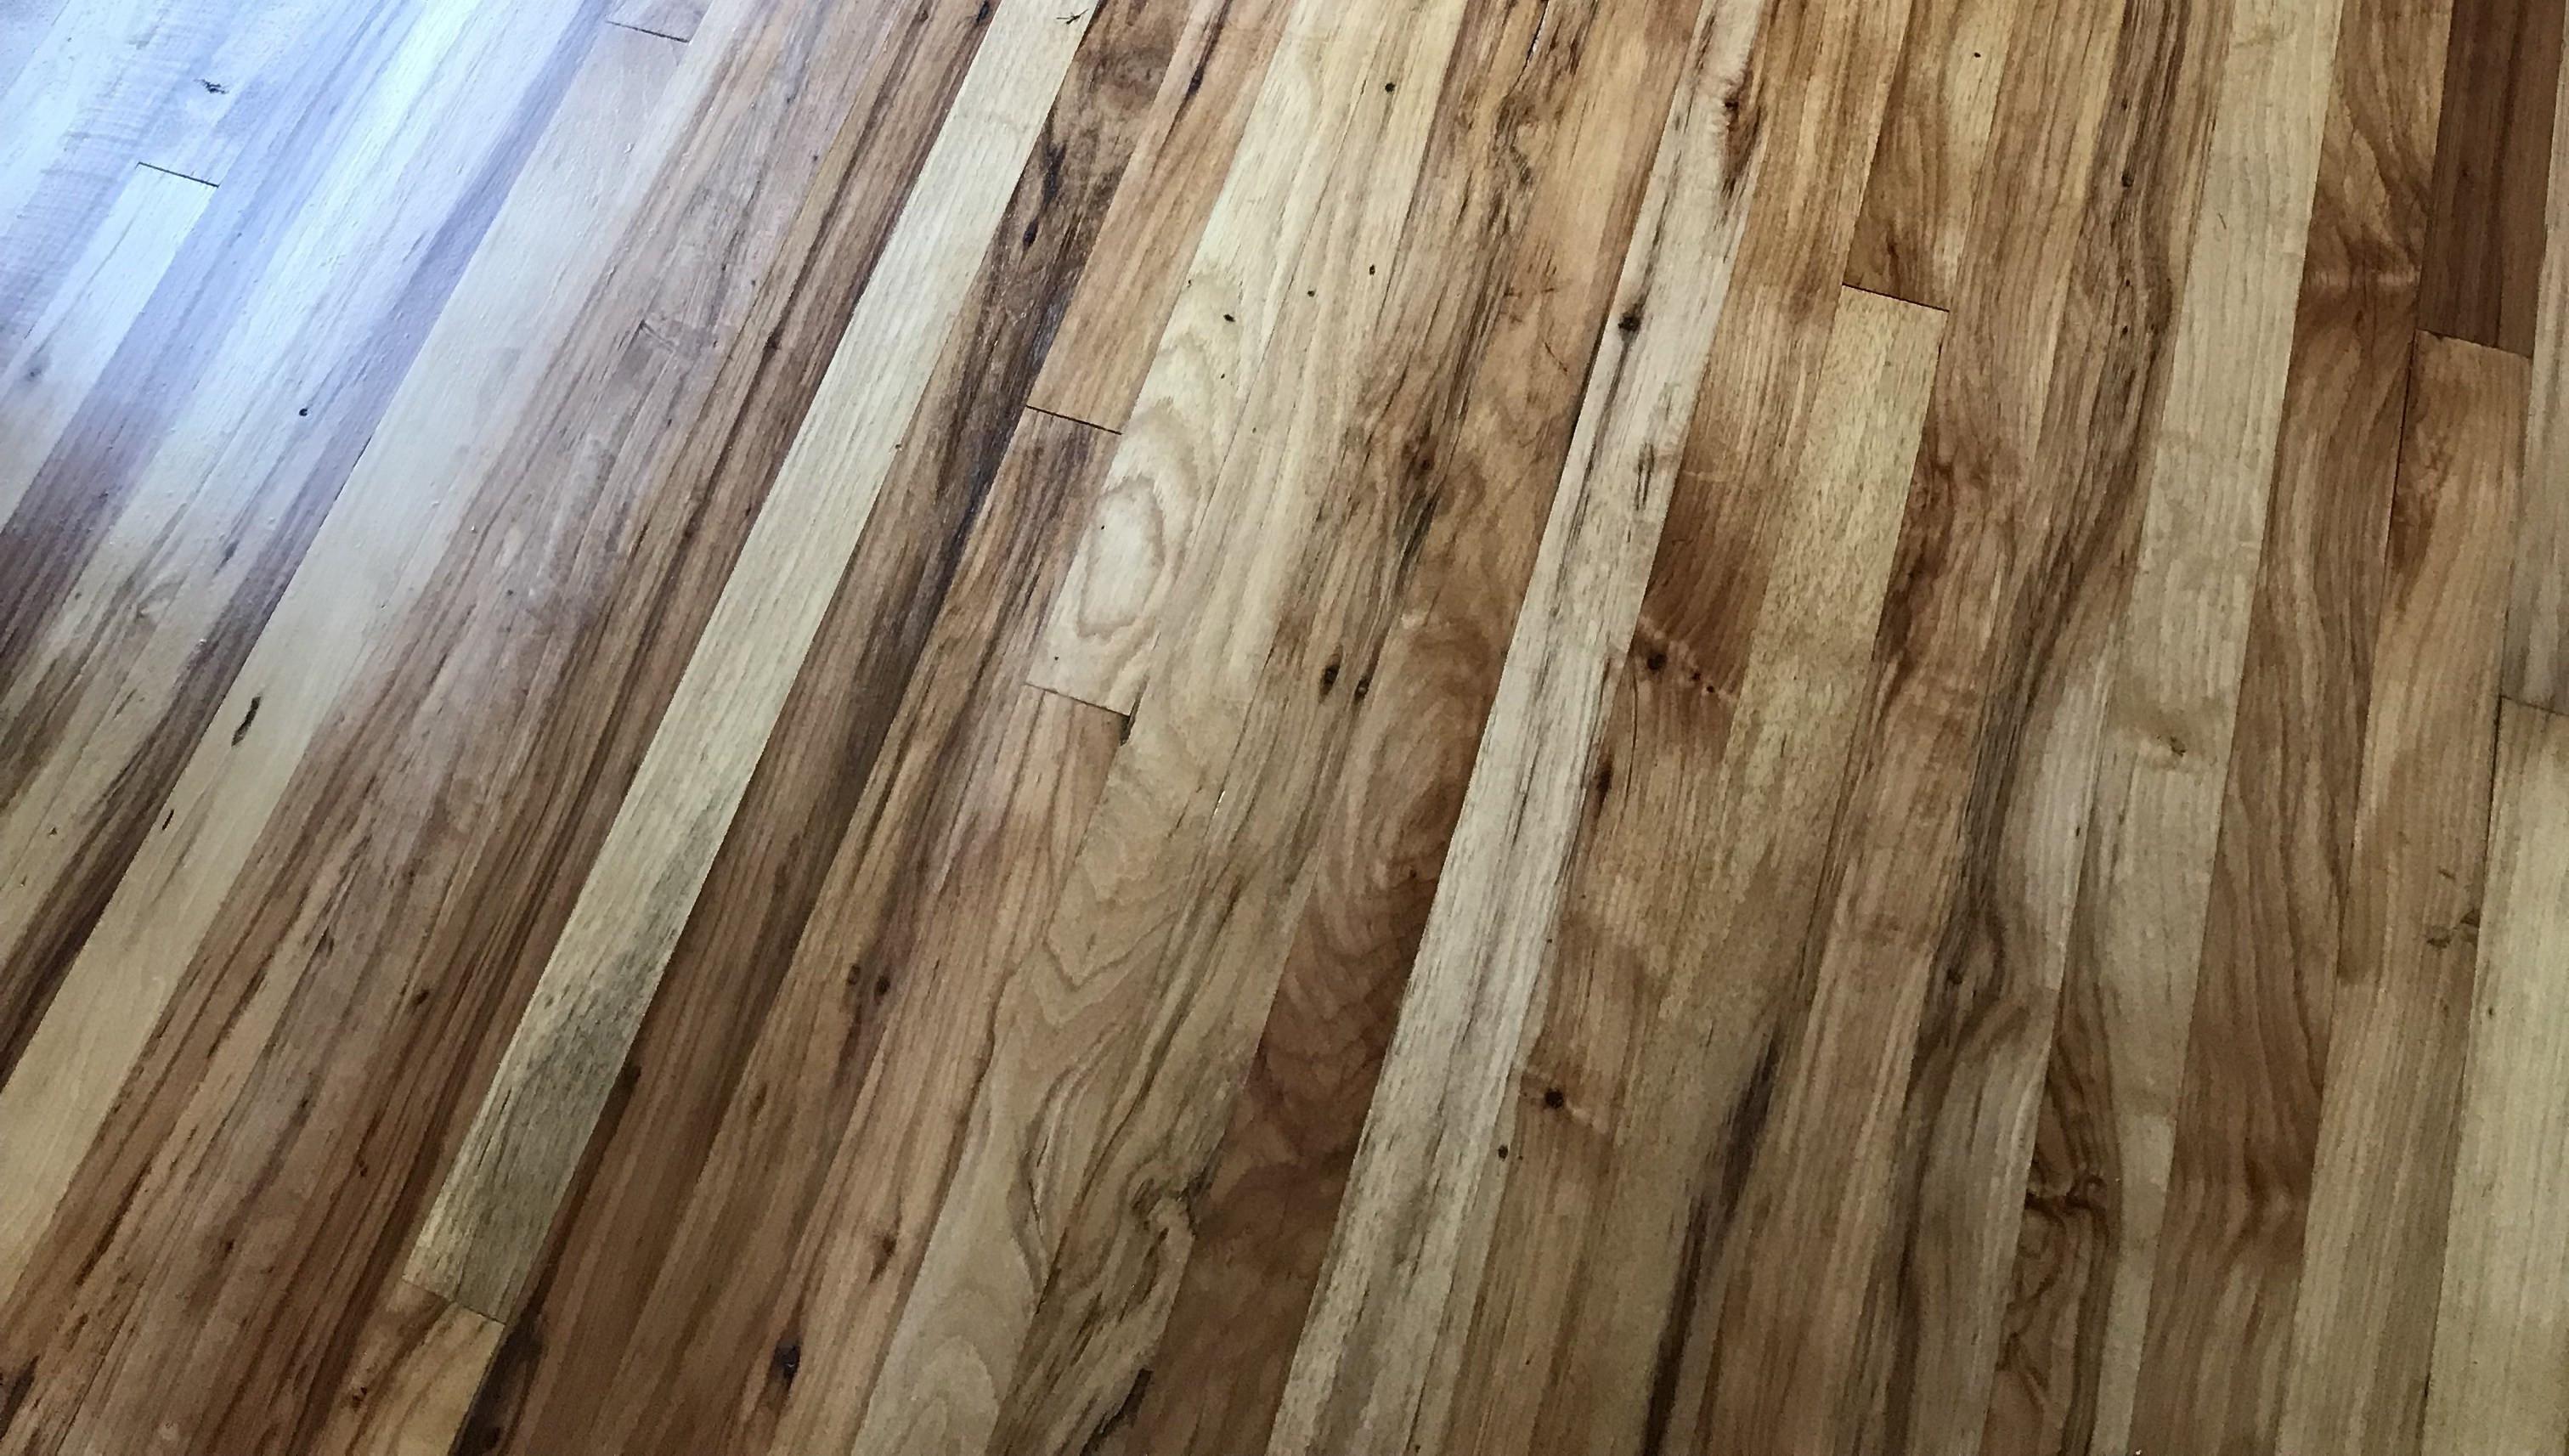 maple hardwood flooring durability of refinishing hardwood floors carlhaven made pertaining to refinishing hardwood floors